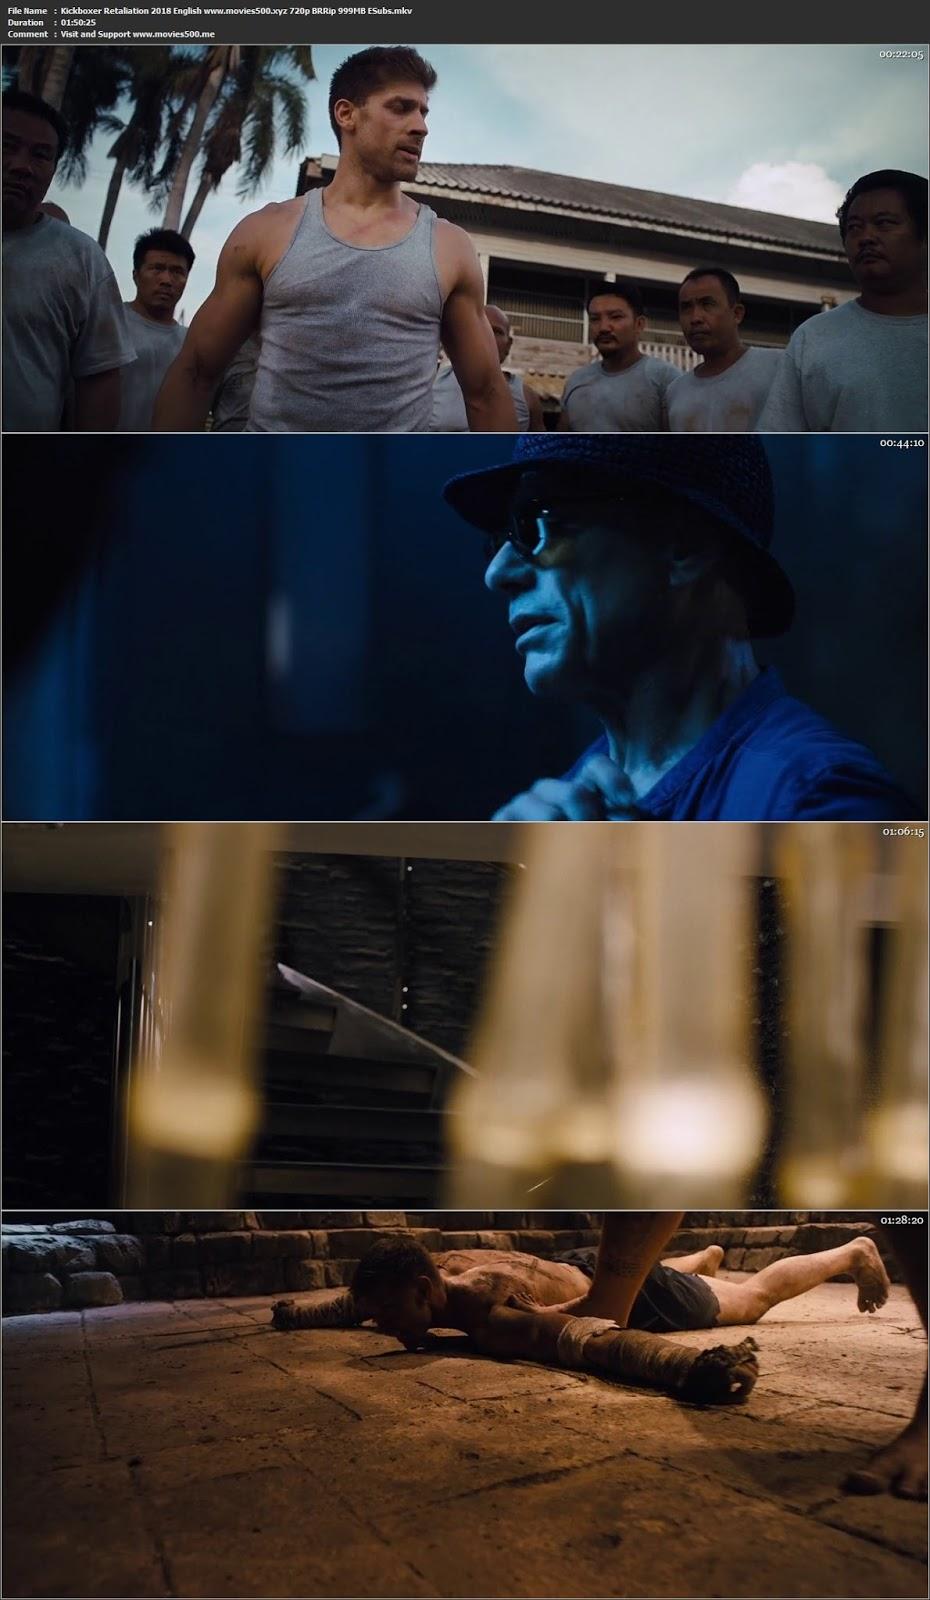 Kickboxer Retaliation 2018 English Full Movie BRRip 720p ESubs at 9966132.com